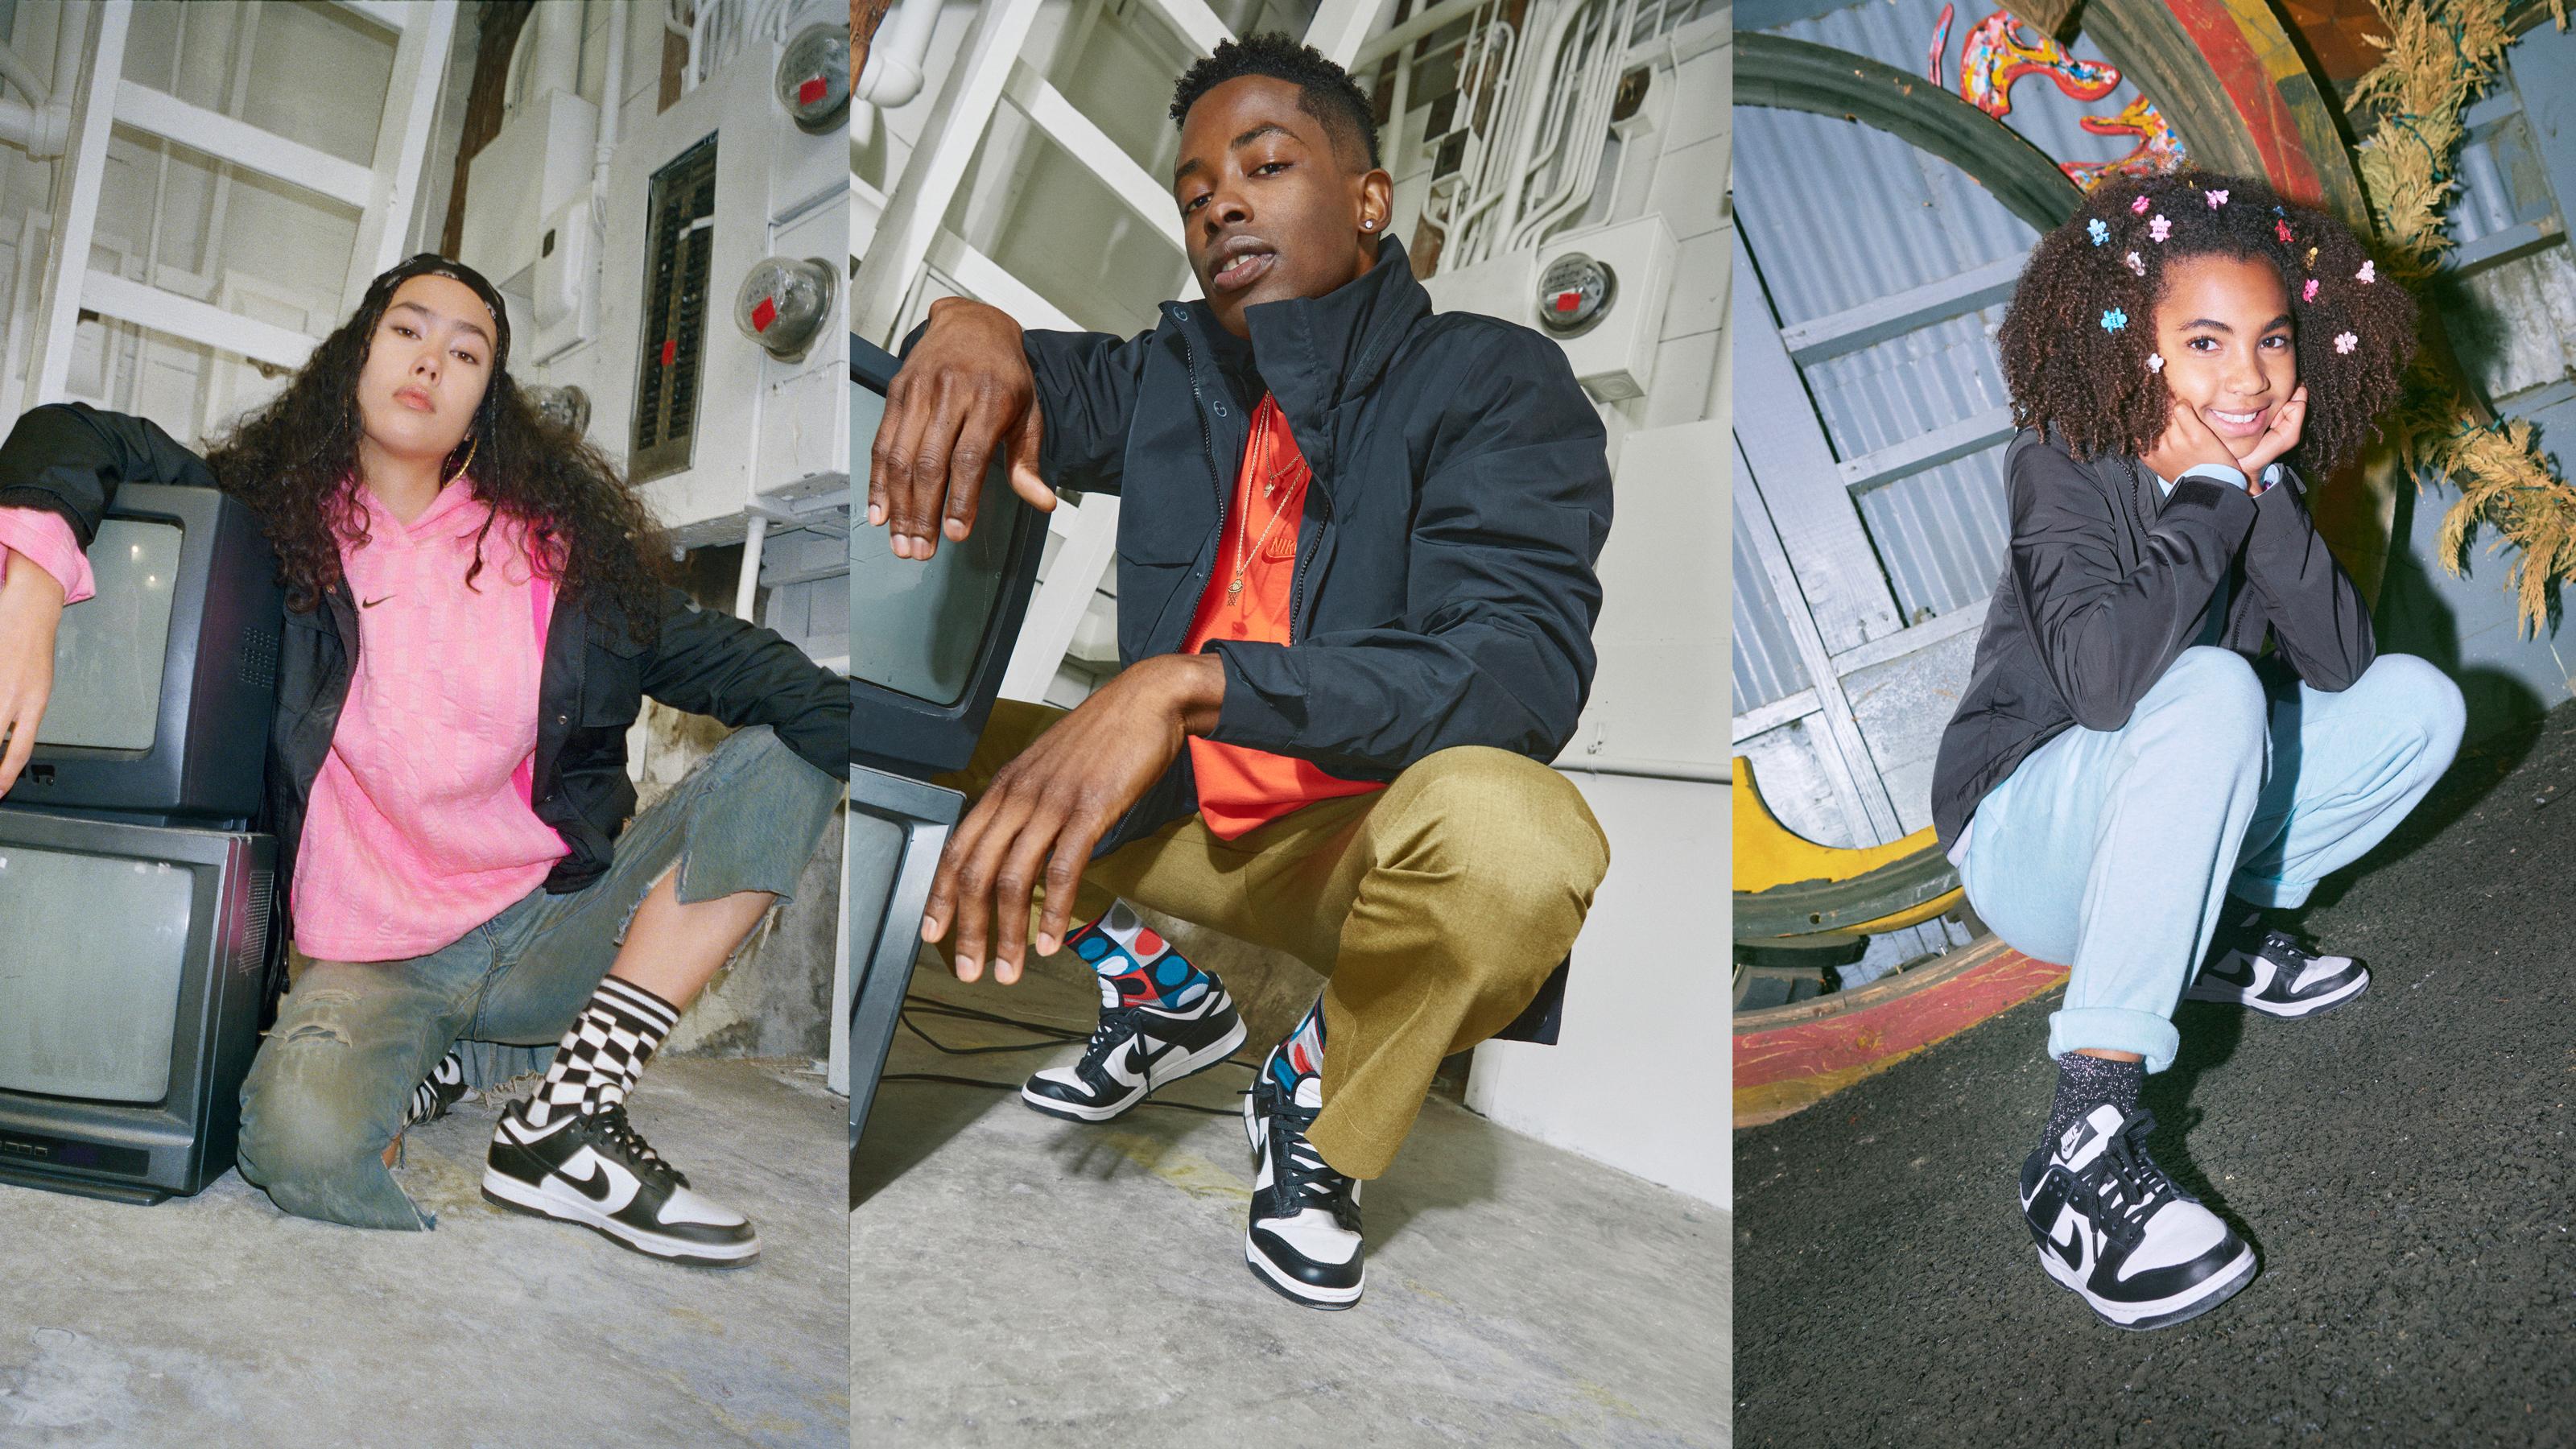 Three different models wear Nike Dunks